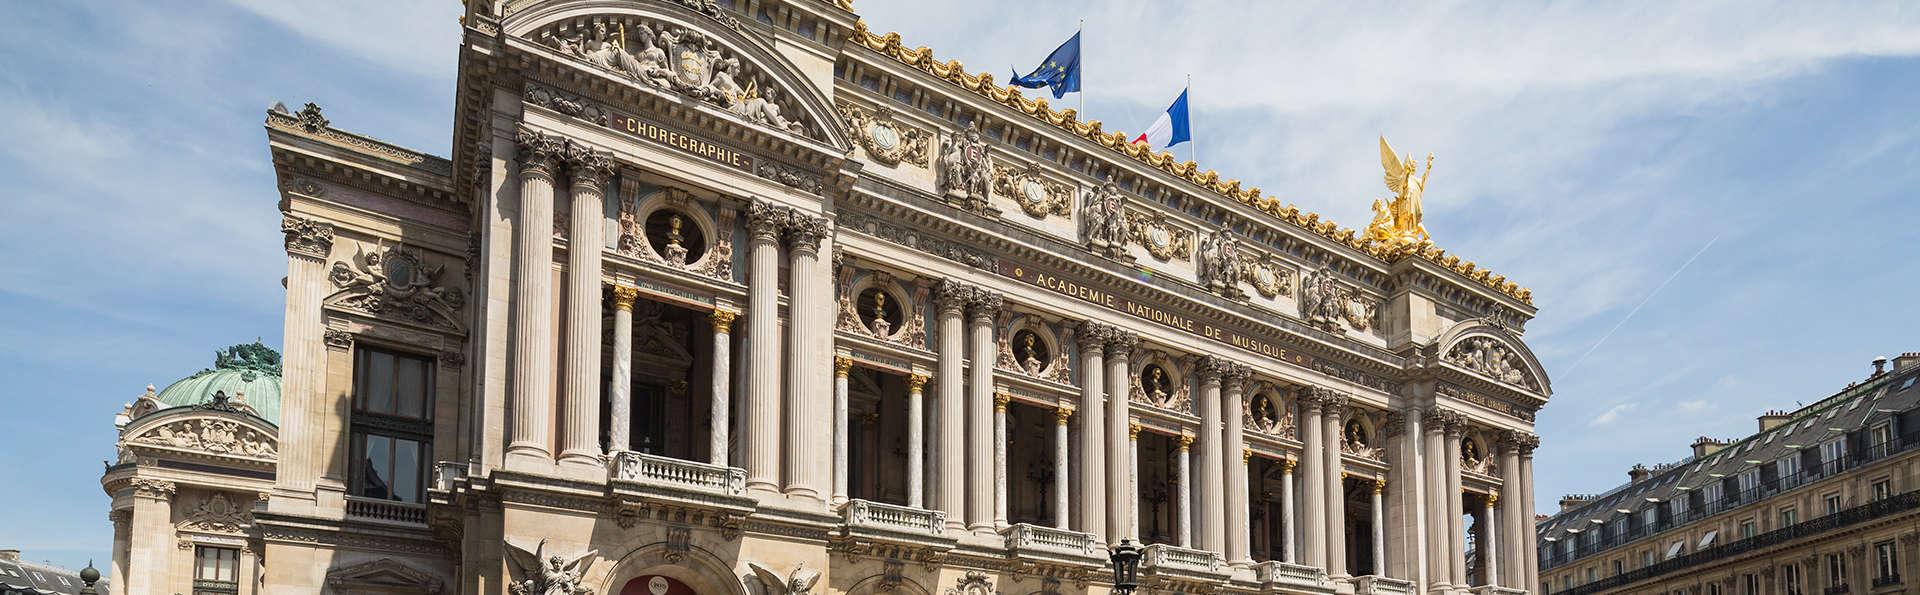 Hôtel Opéra Frochot - Edit_Destination.jpg